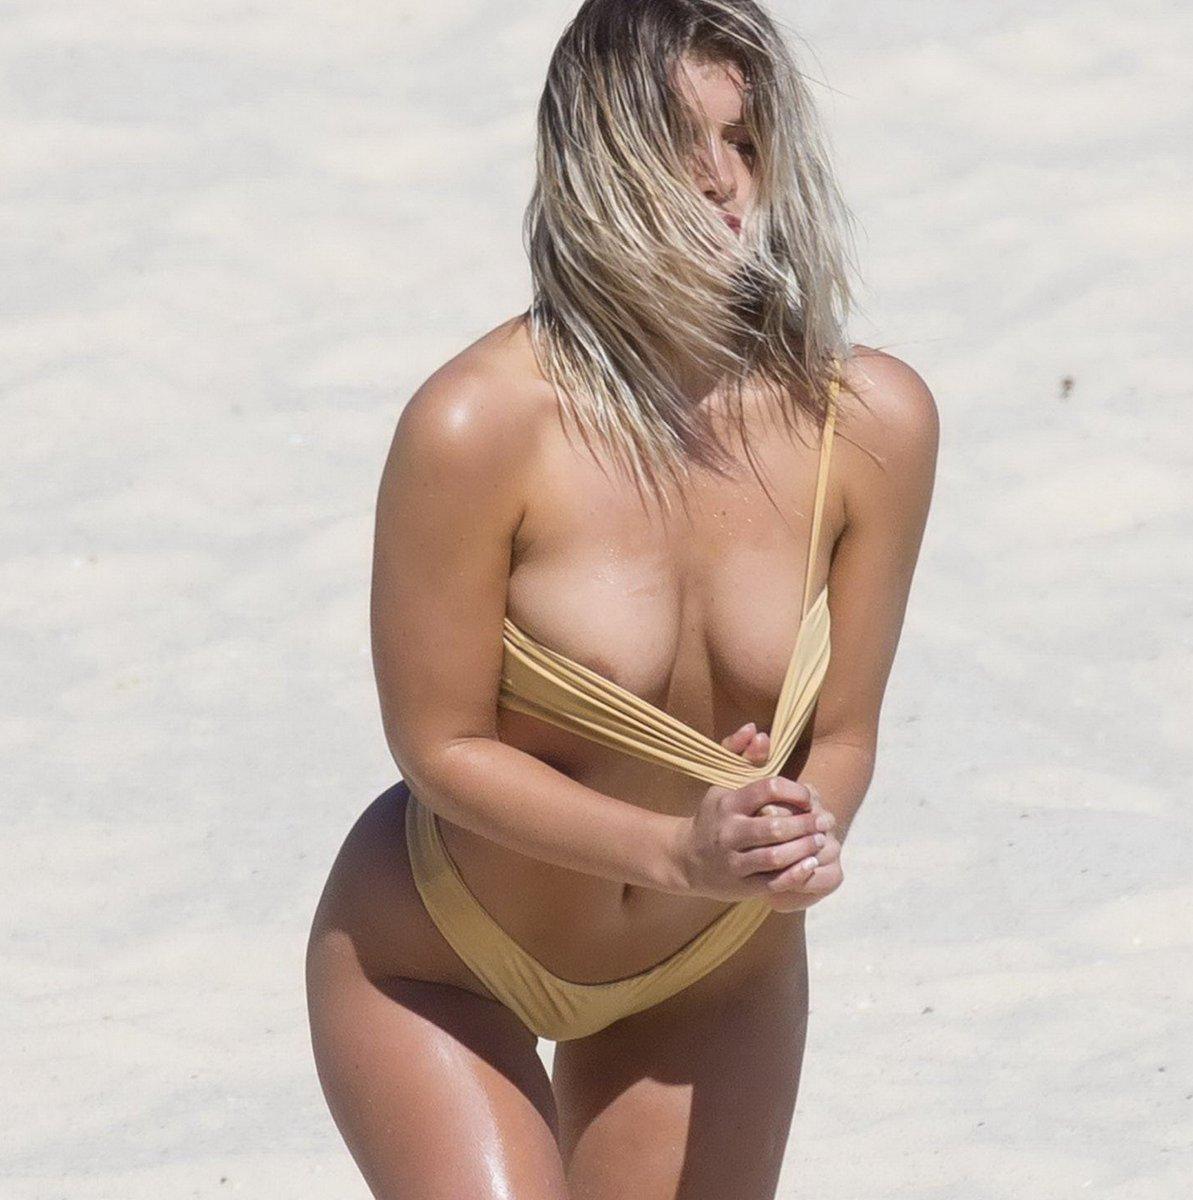 beach-bikini-slip-erotic-bubble-butts